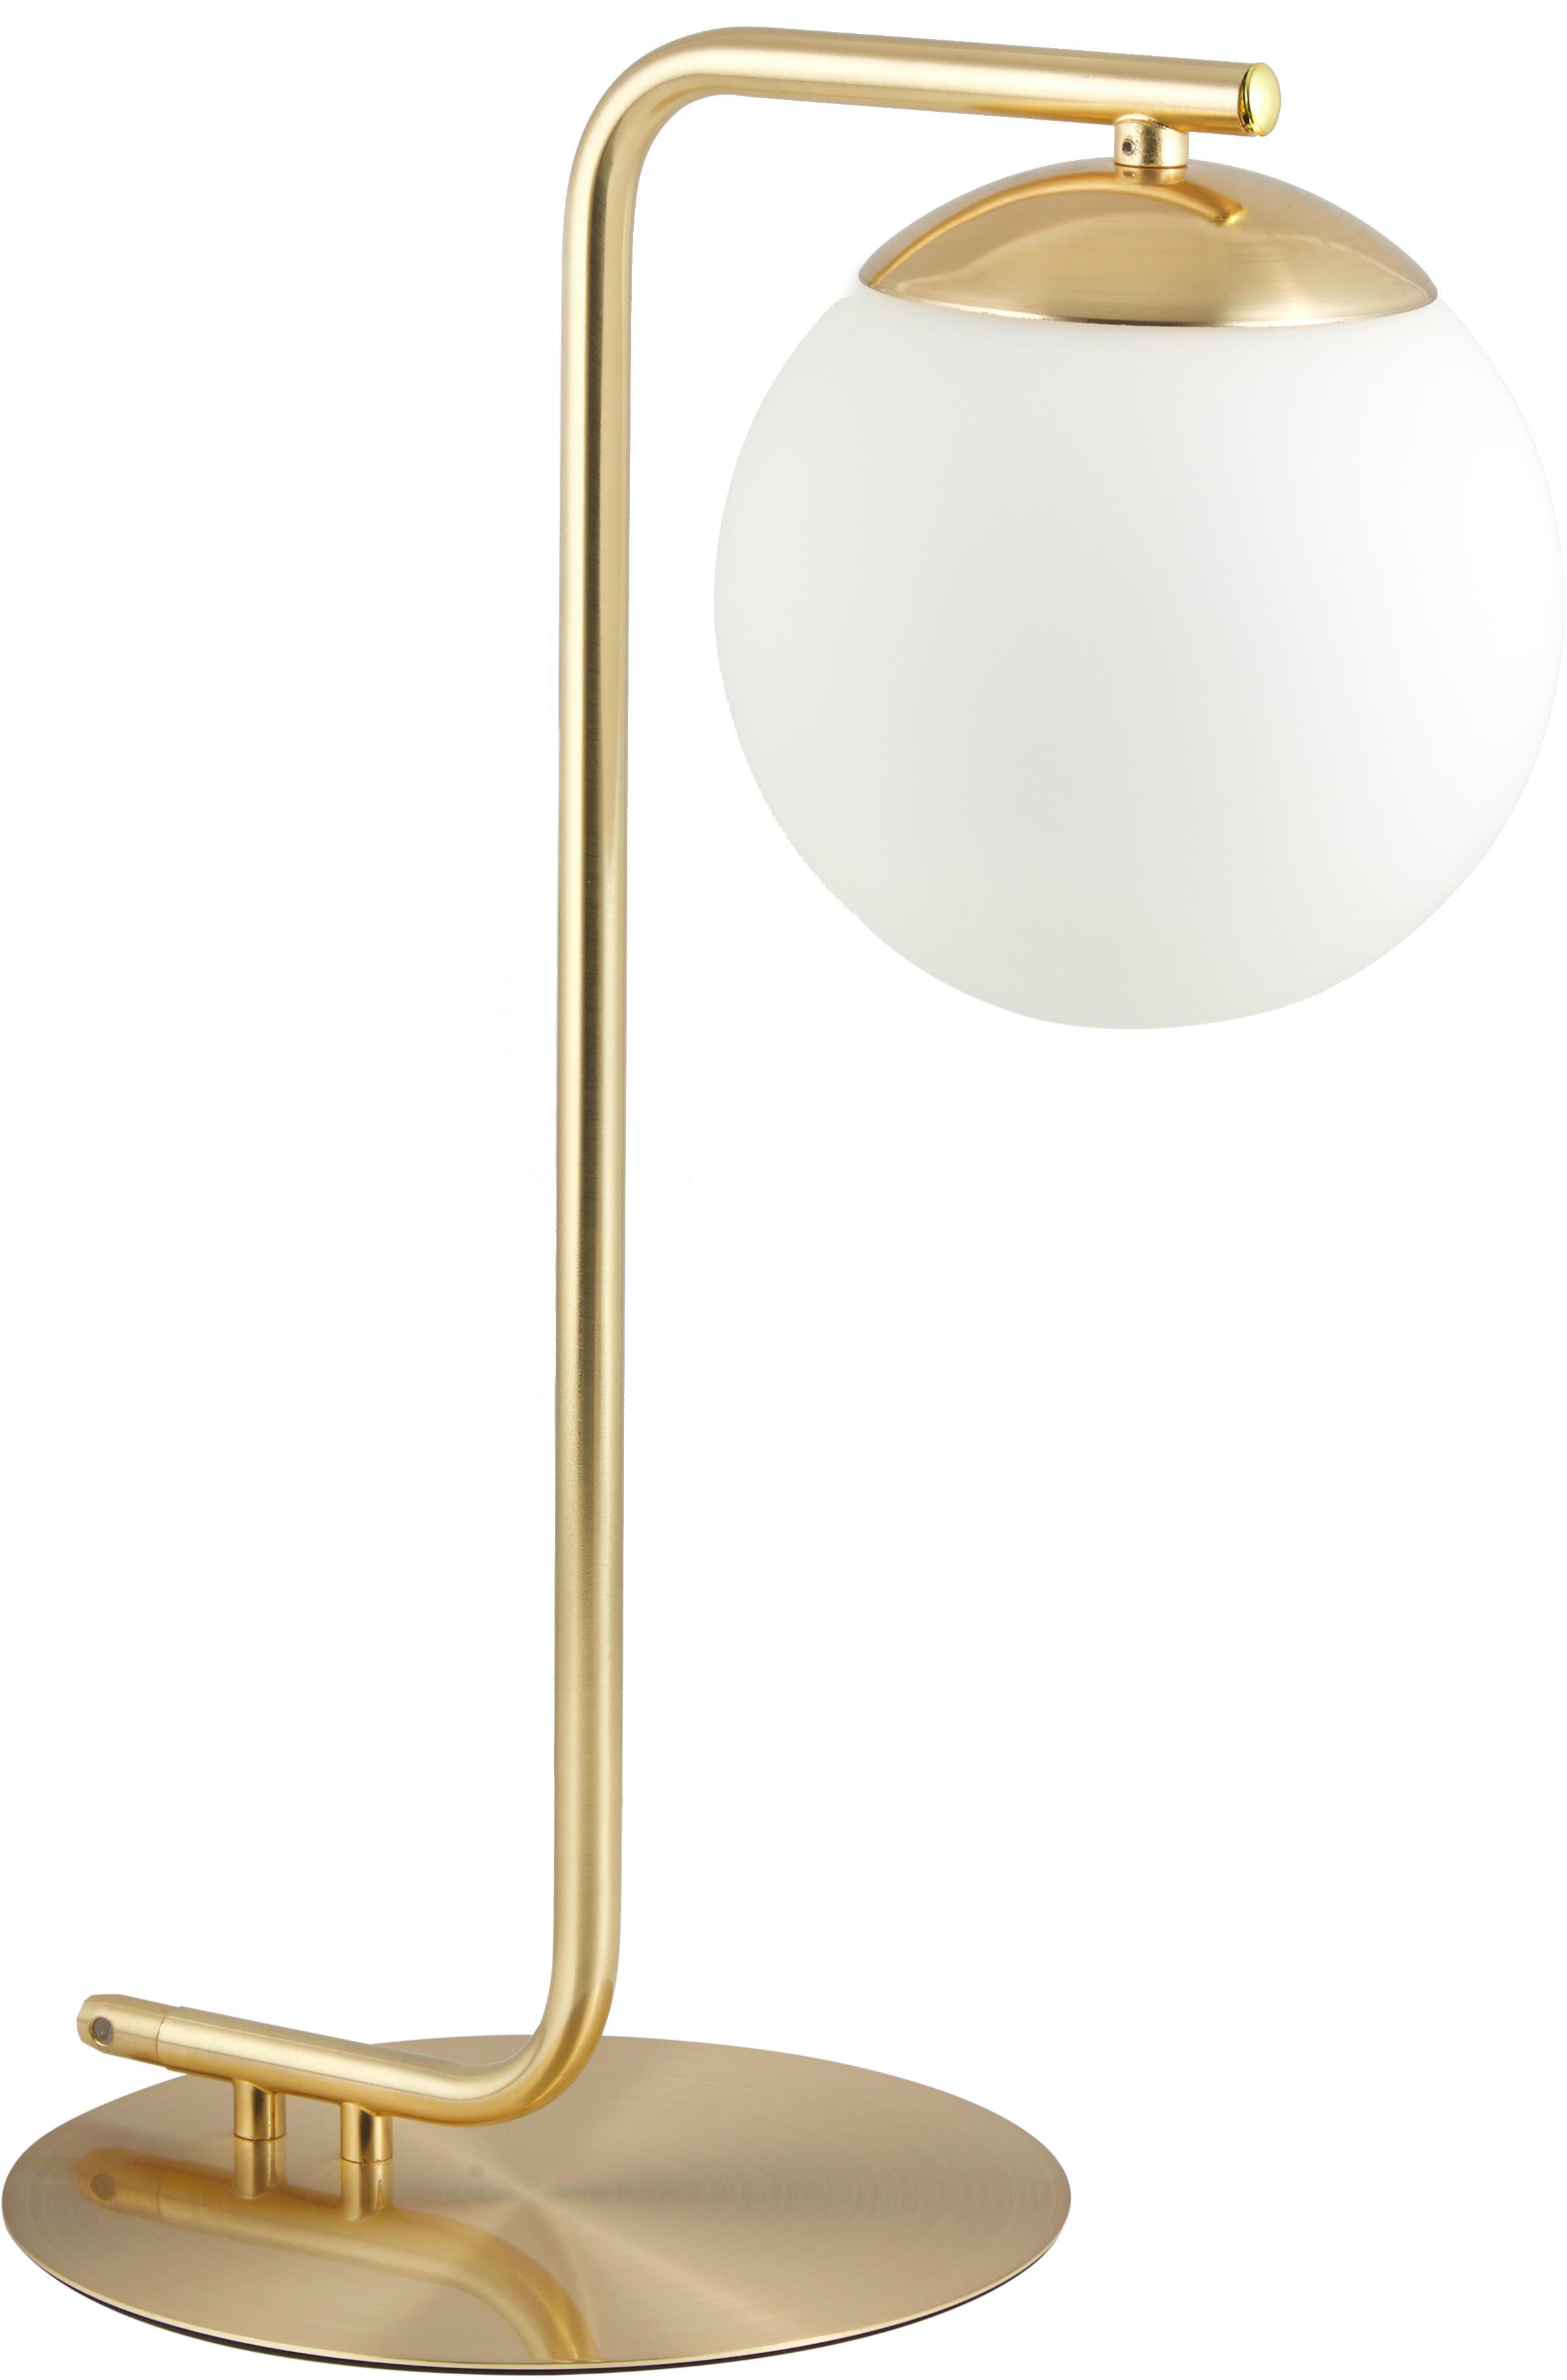 Tischlampe Grant mit Messingfuss, Lampenschirm: Opalglas, Messing, Weiss, 20 x 41 cm